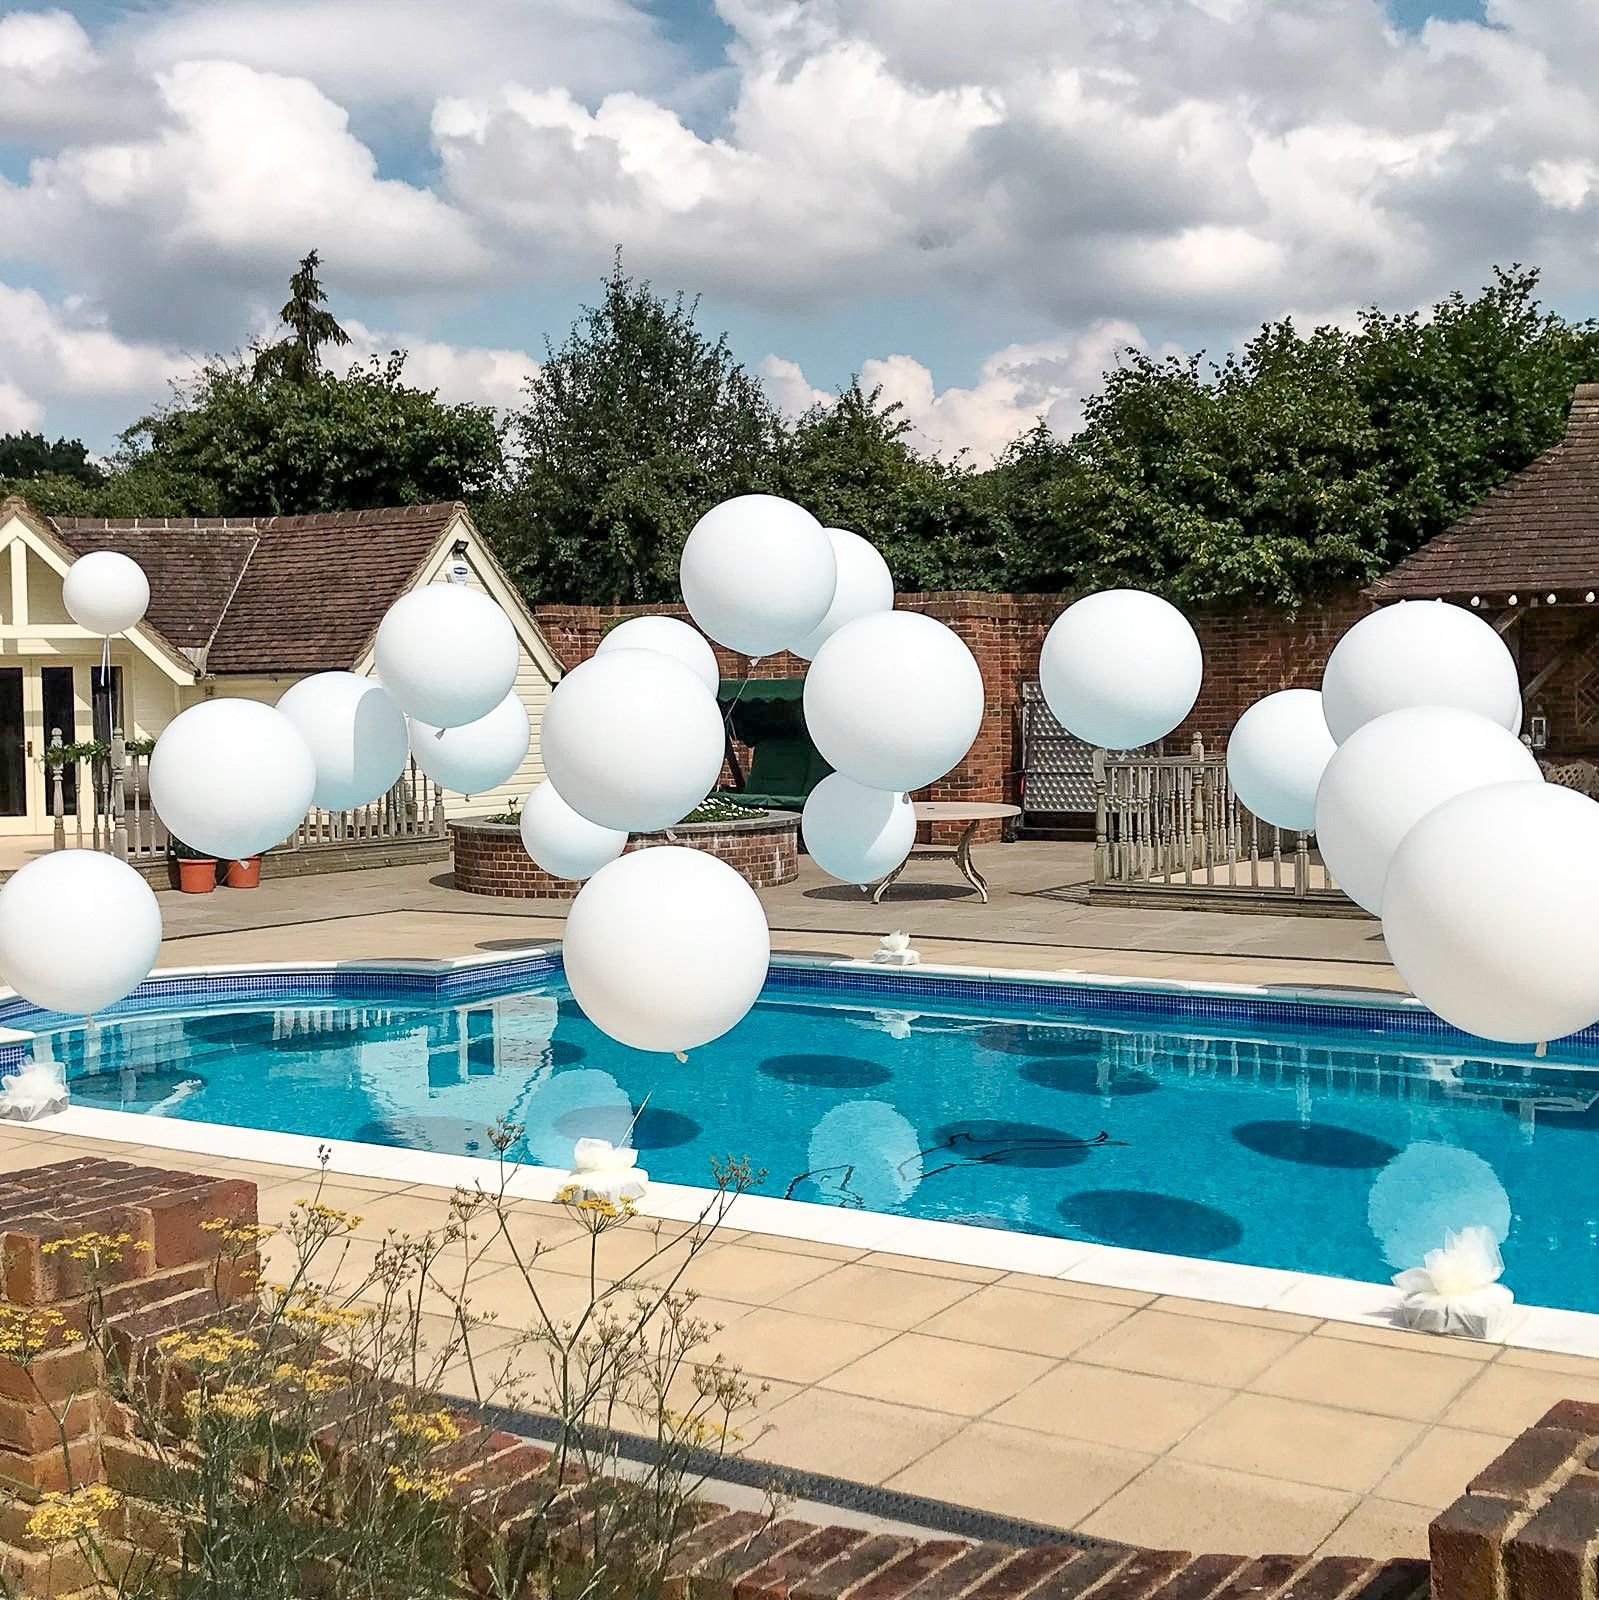 Pool Balloons Pool Party Backyard Pool Parties Wedding Pool